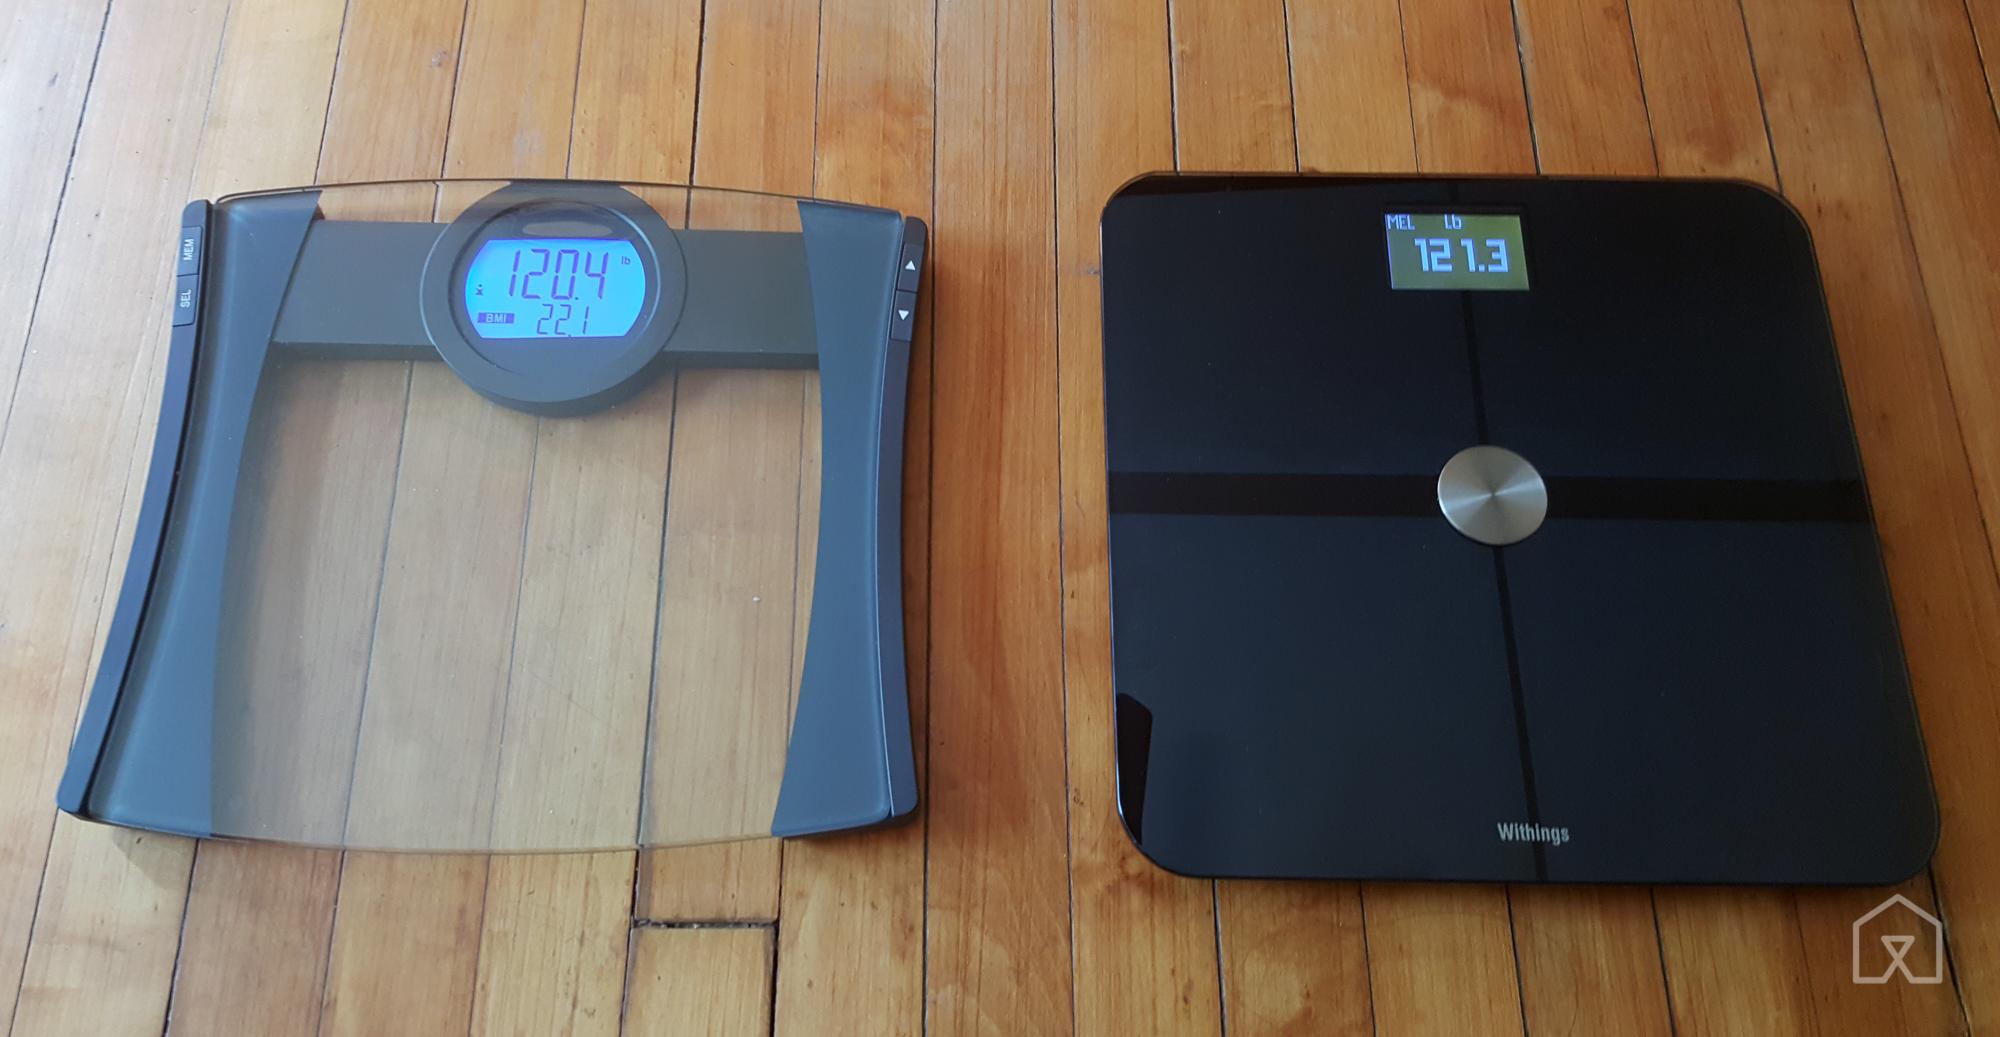 Best accurate bathroom scales - Best Accurate Bathroom Scales 26